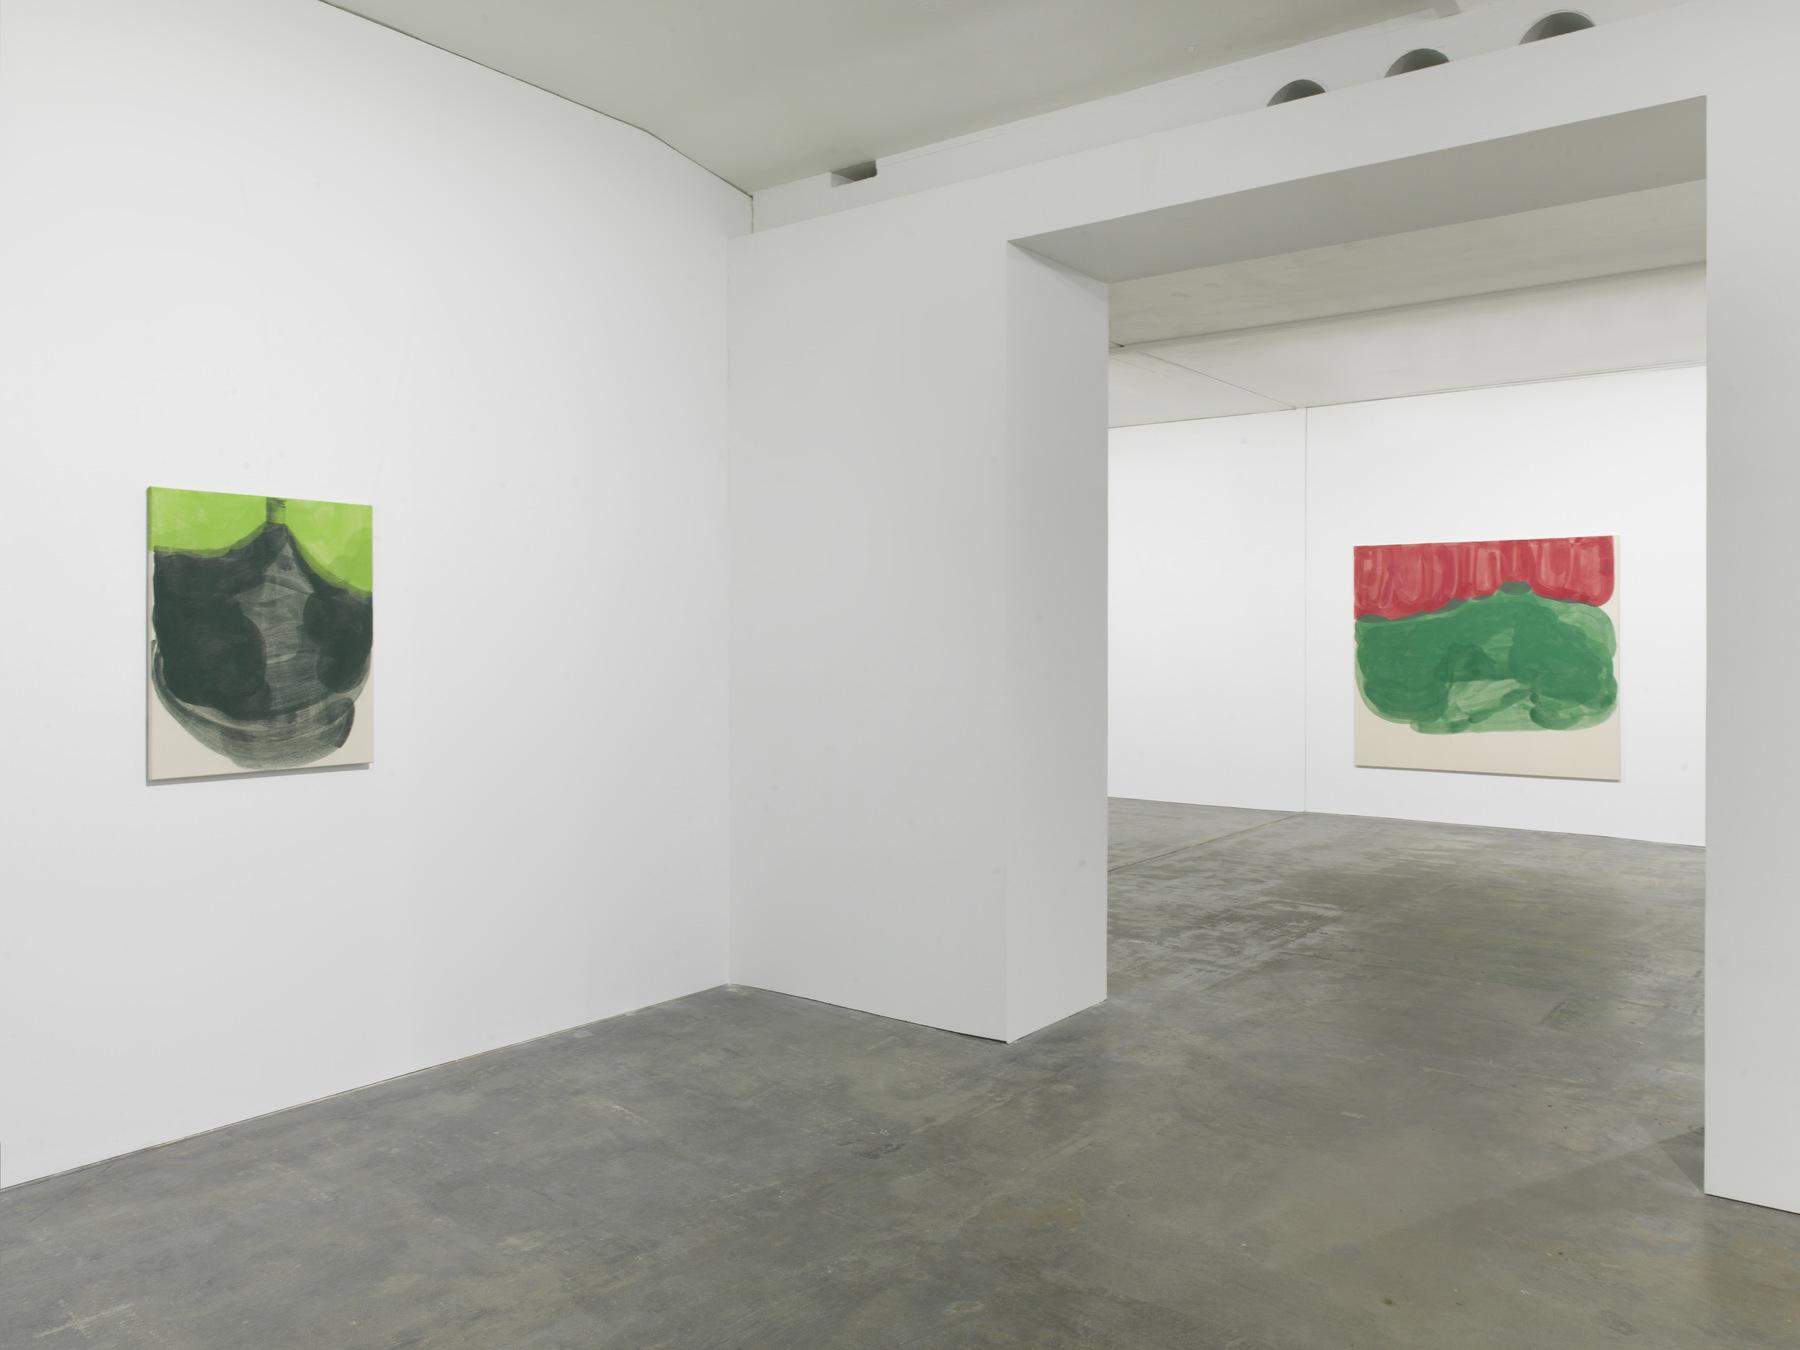 Tamina Amadyar_10,000 hours_Galerie Guido W. Baudach, Berlin_10